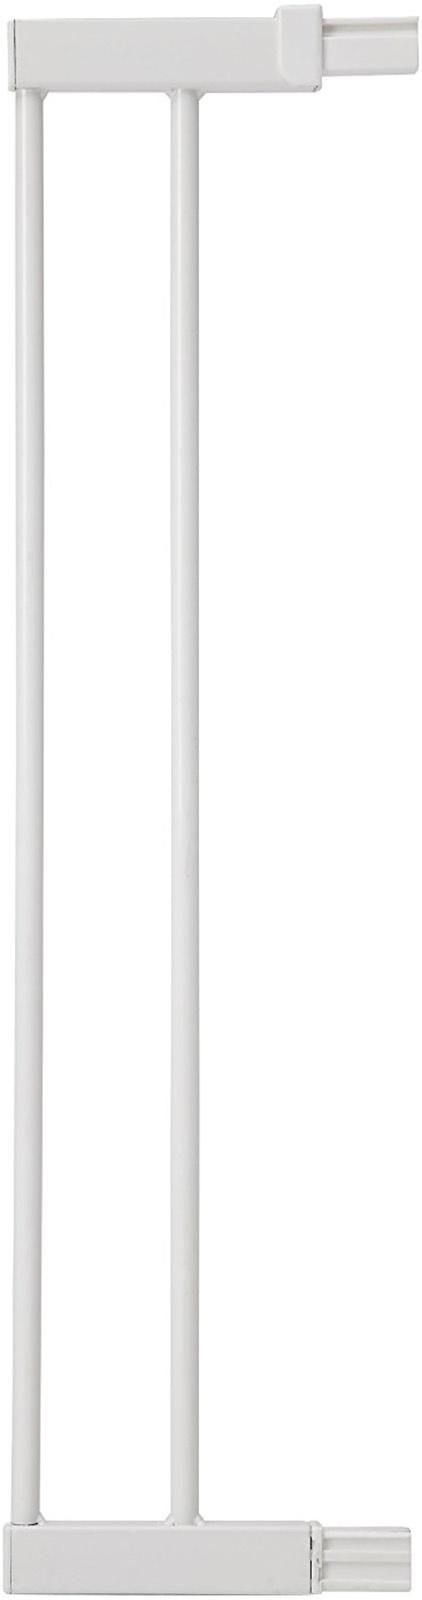 Дополнительная секция Safety 1st Pressure Gare Easy Close Metal plus 14 см белый